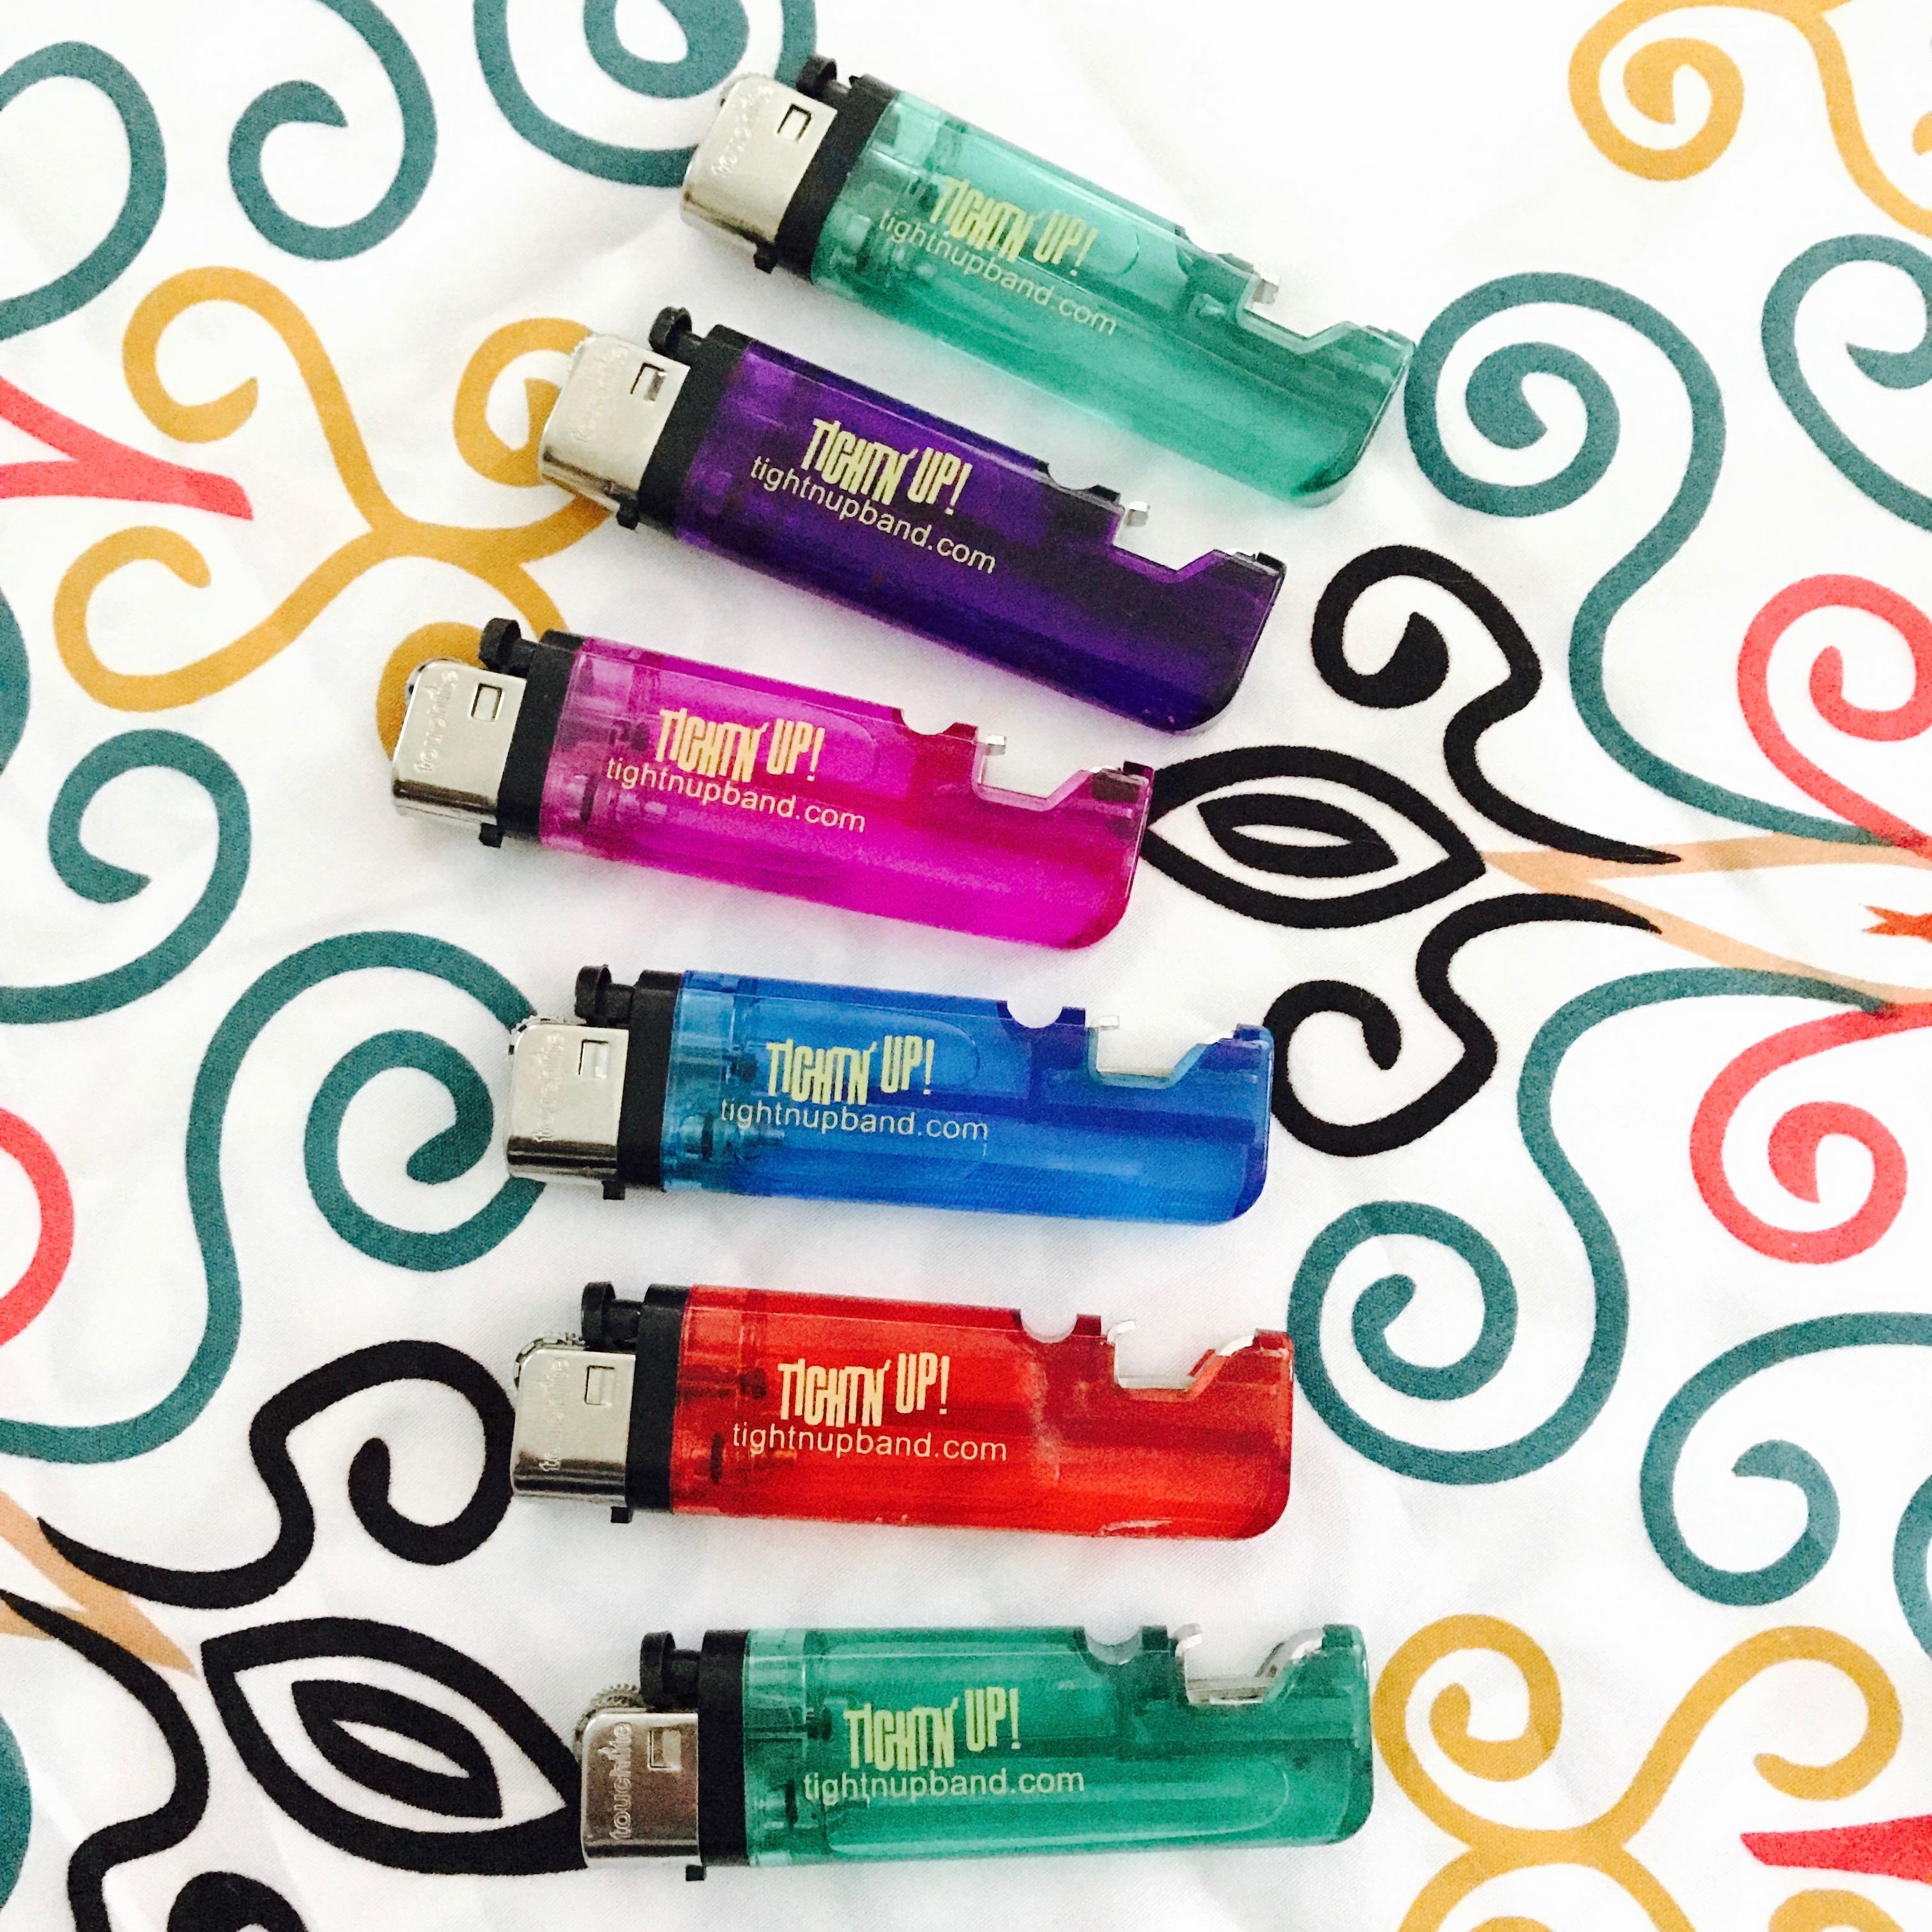 tightn up lighter with bottle opener funk drink up light up